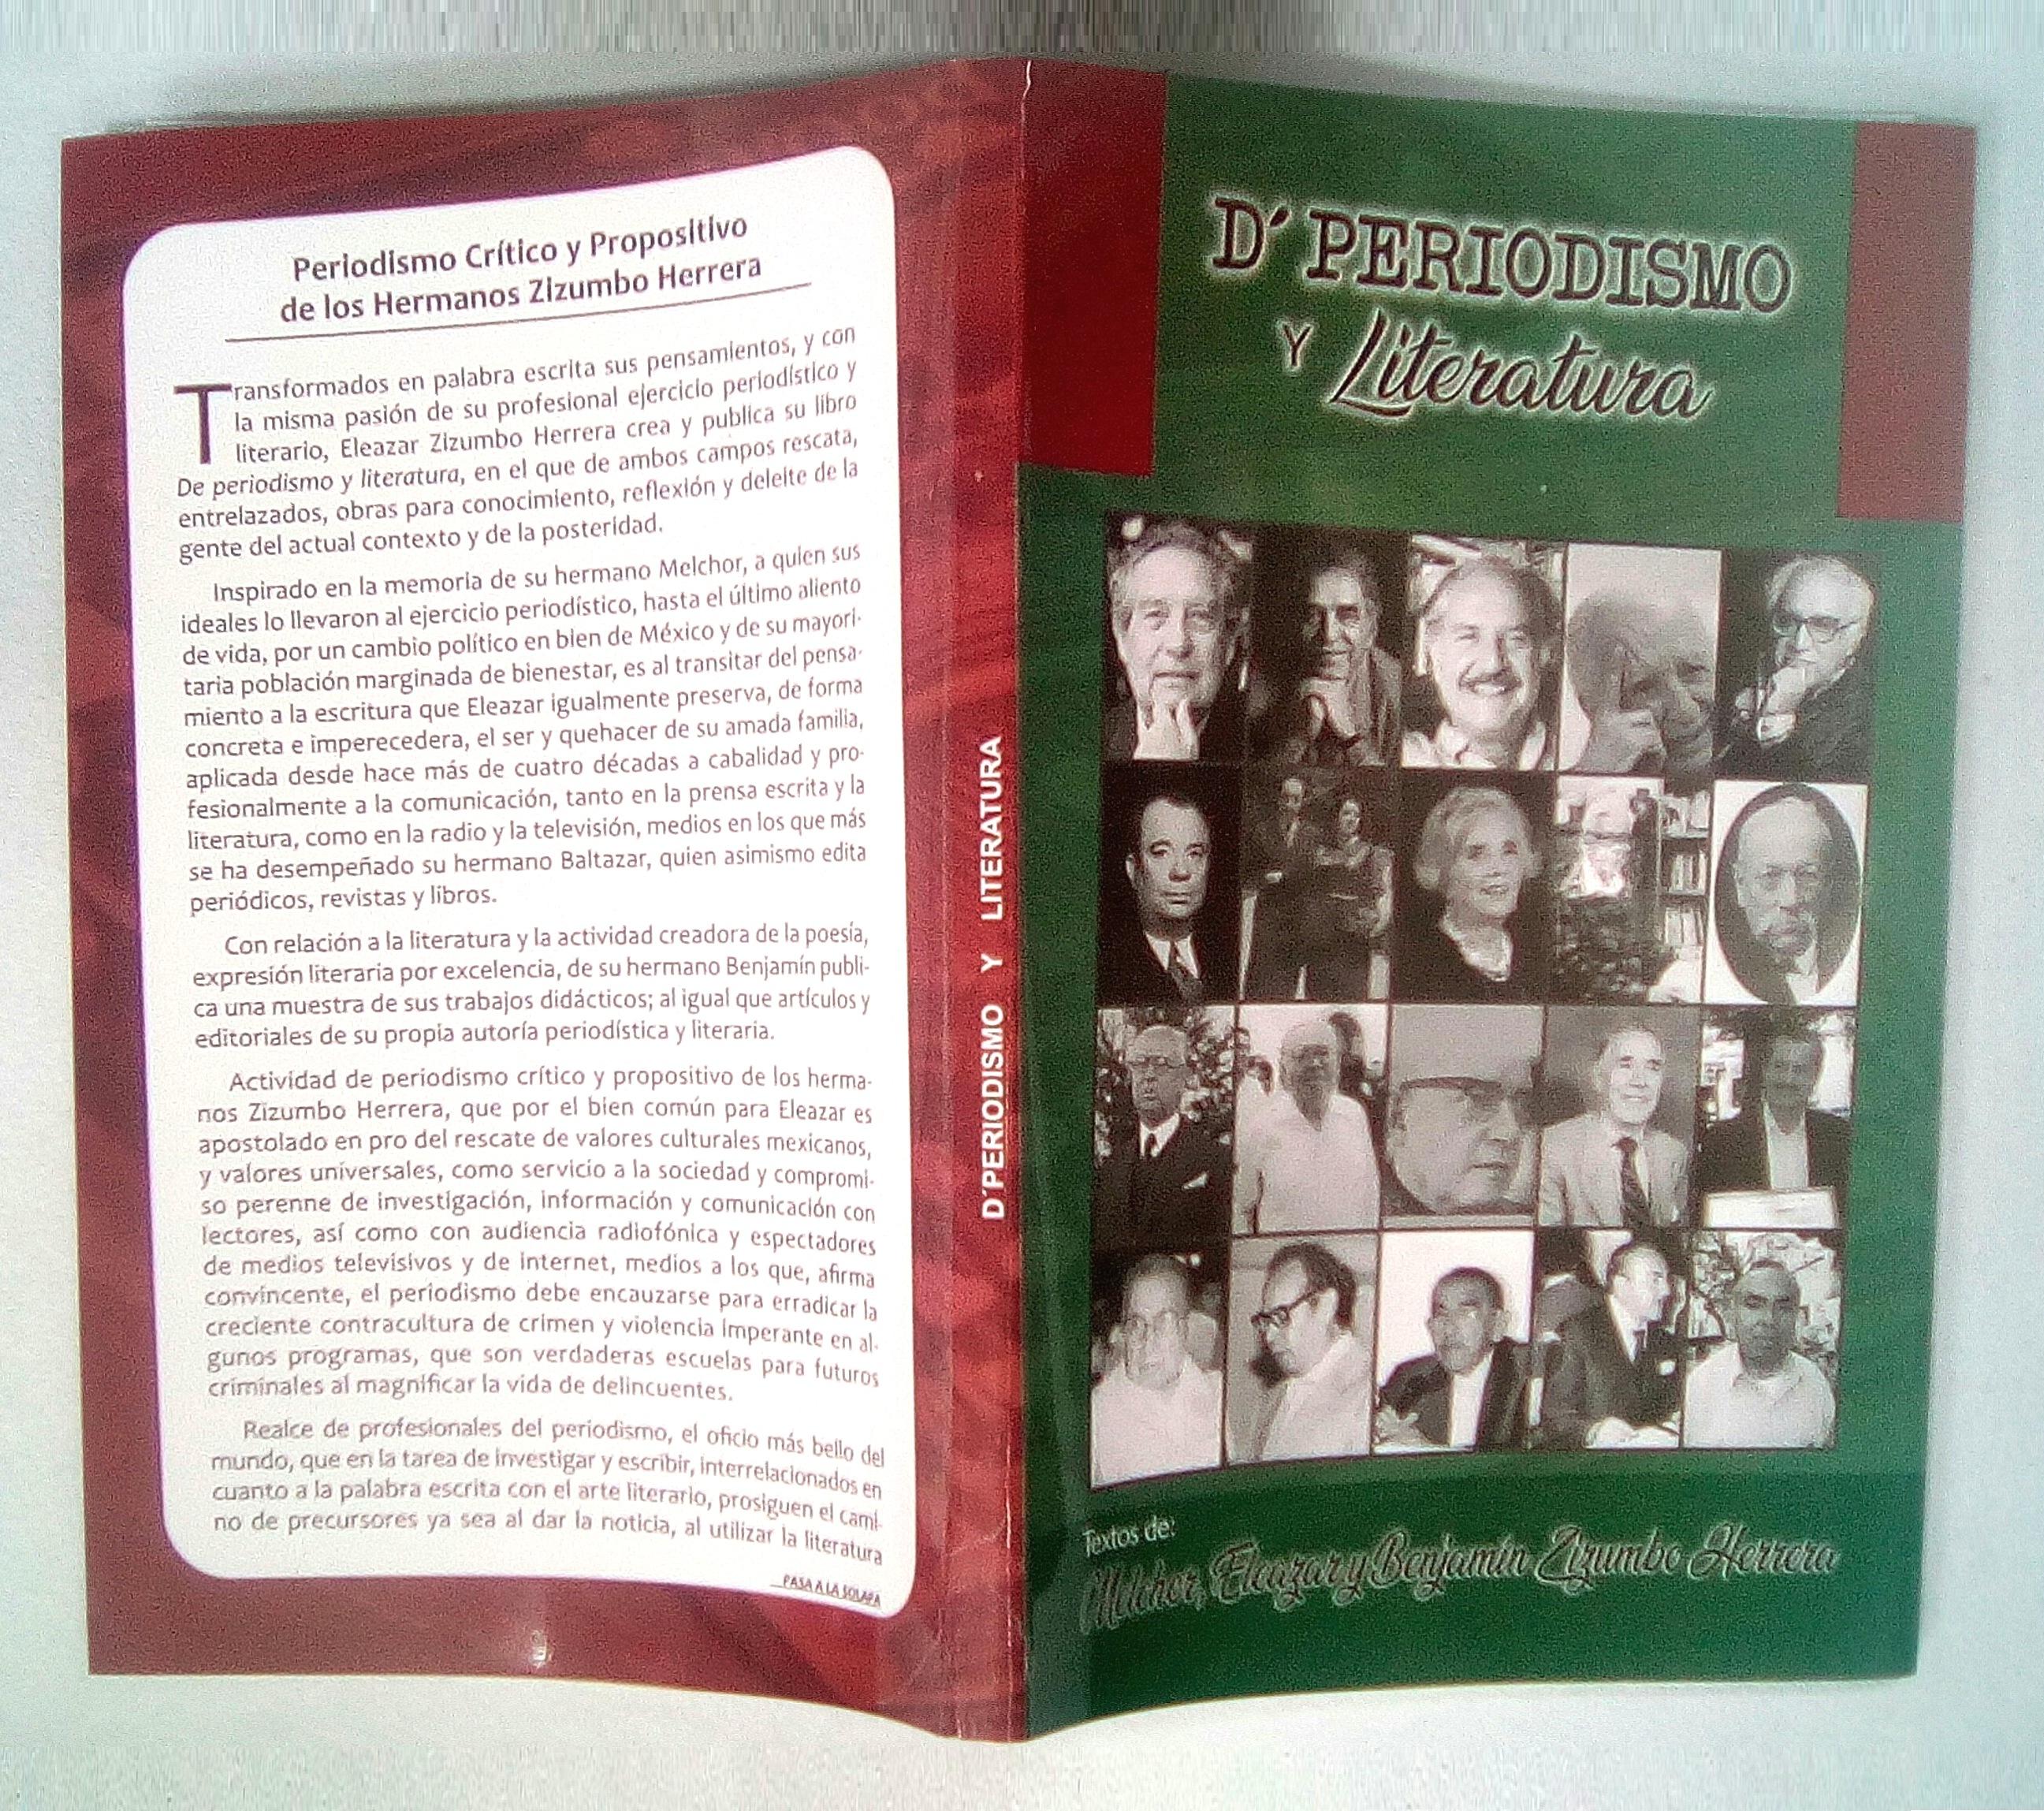 De periodismo y literatua. Eleazar Zizumbo Herrera. Portada-Contraportada